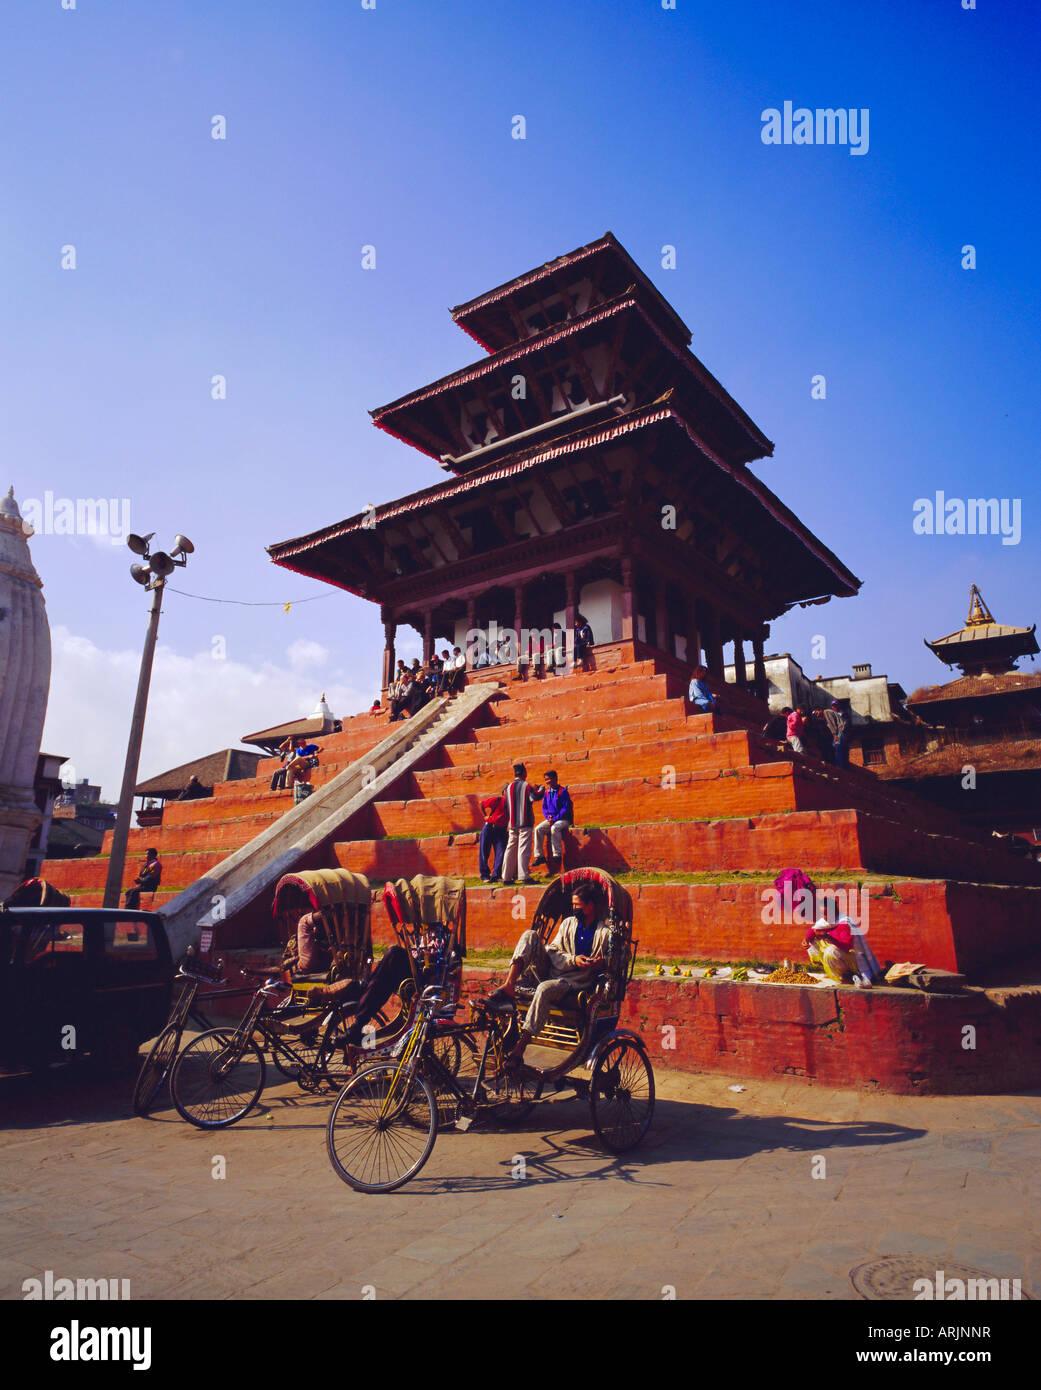 View of Maju Deval Temples and Durbar Square, Katmandu, Nepal - Stock Image